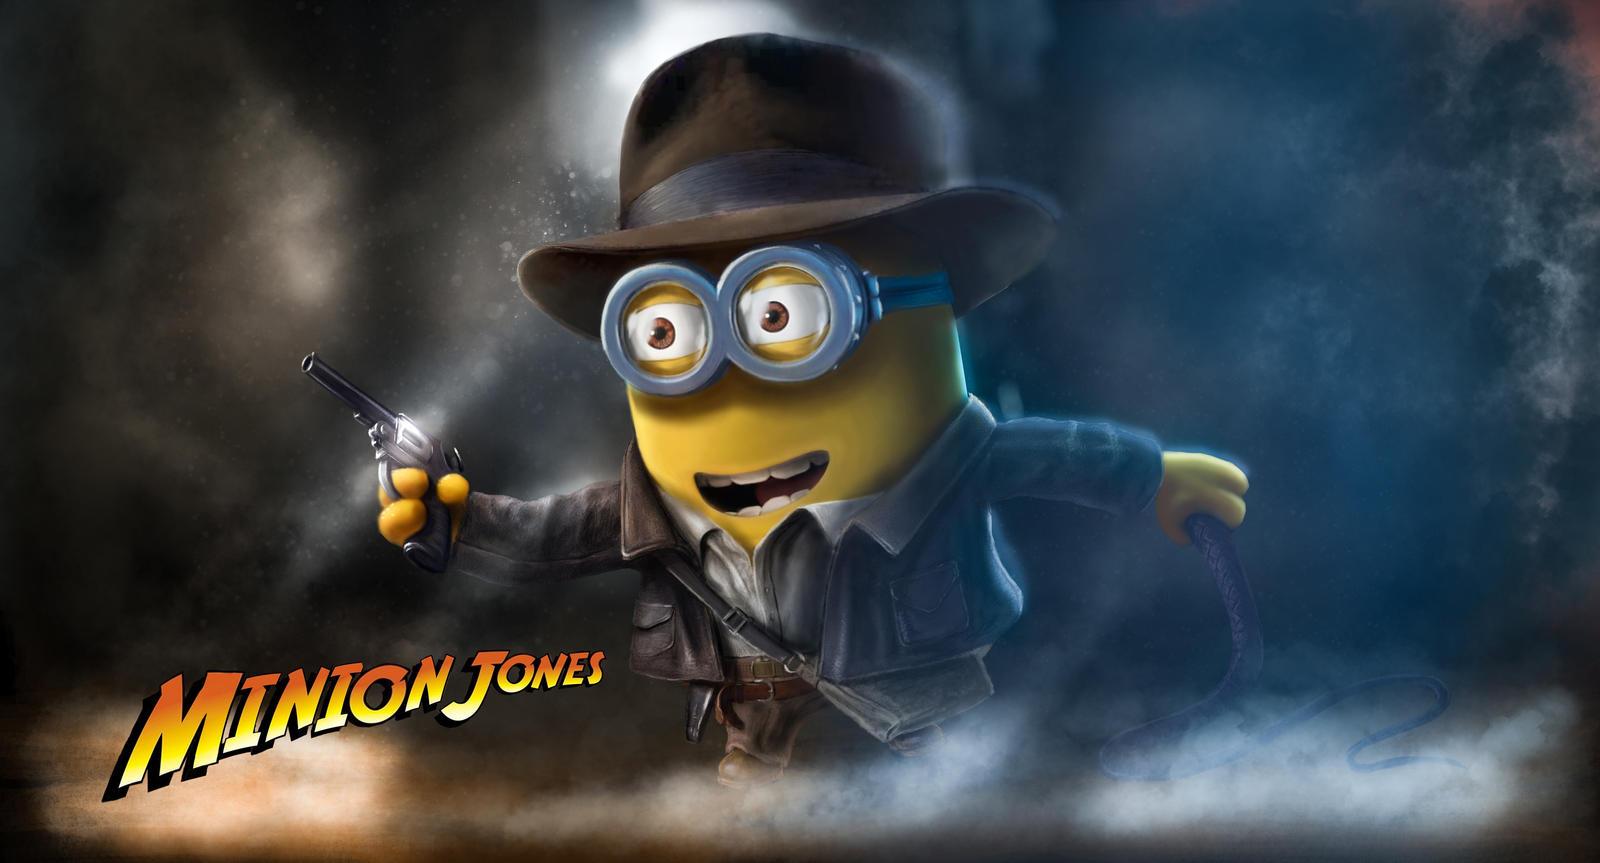 Minion Indiana Jones Art by AlexanderLevett